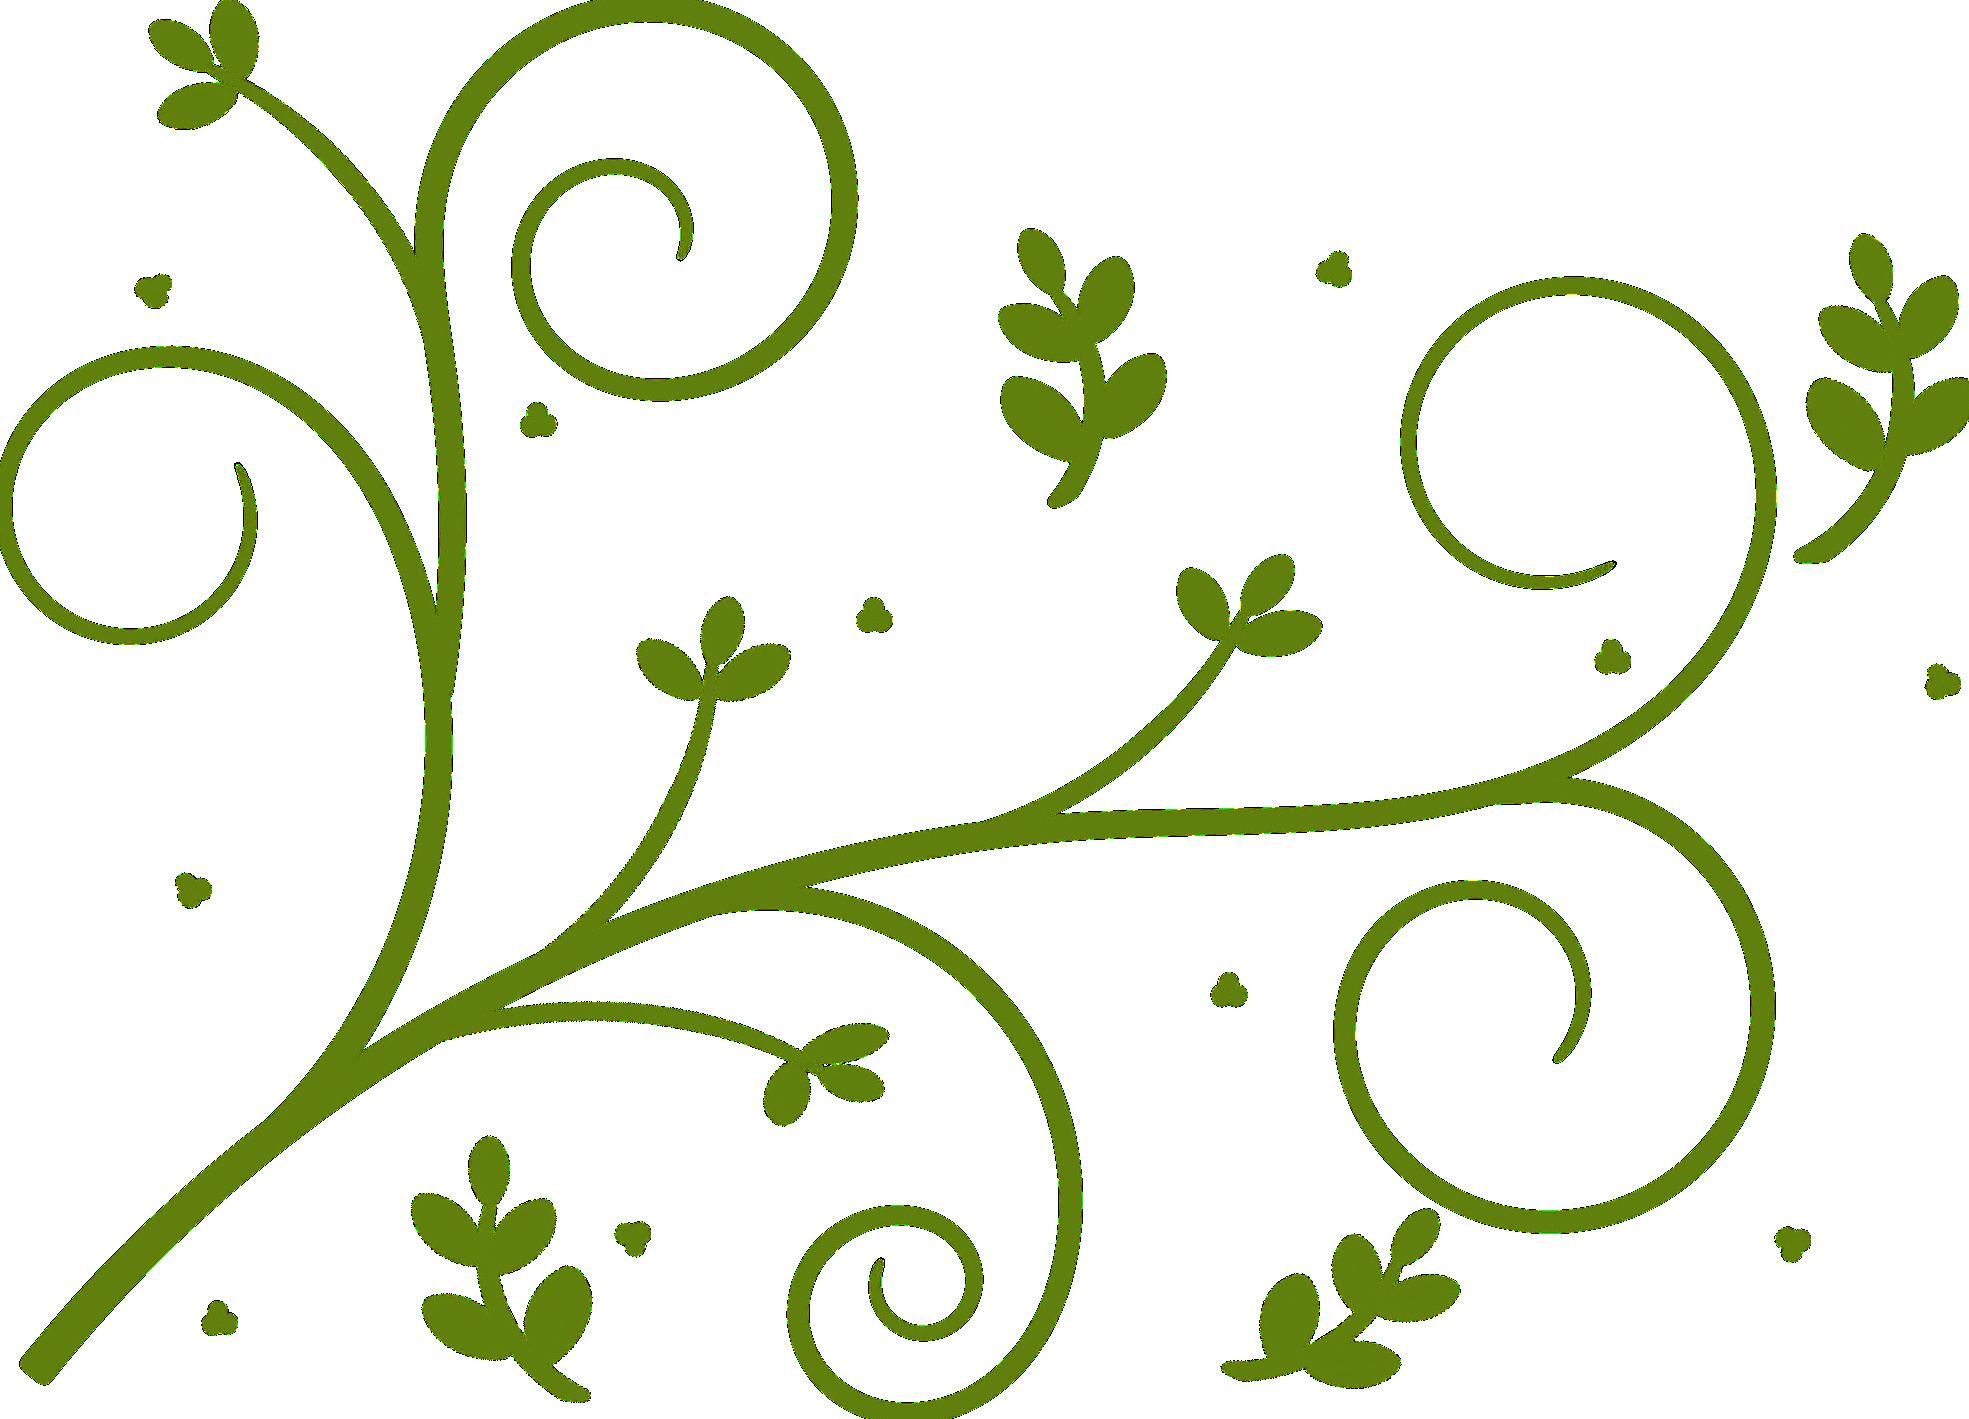 Flowerweb brings you the. Garland clipart fern